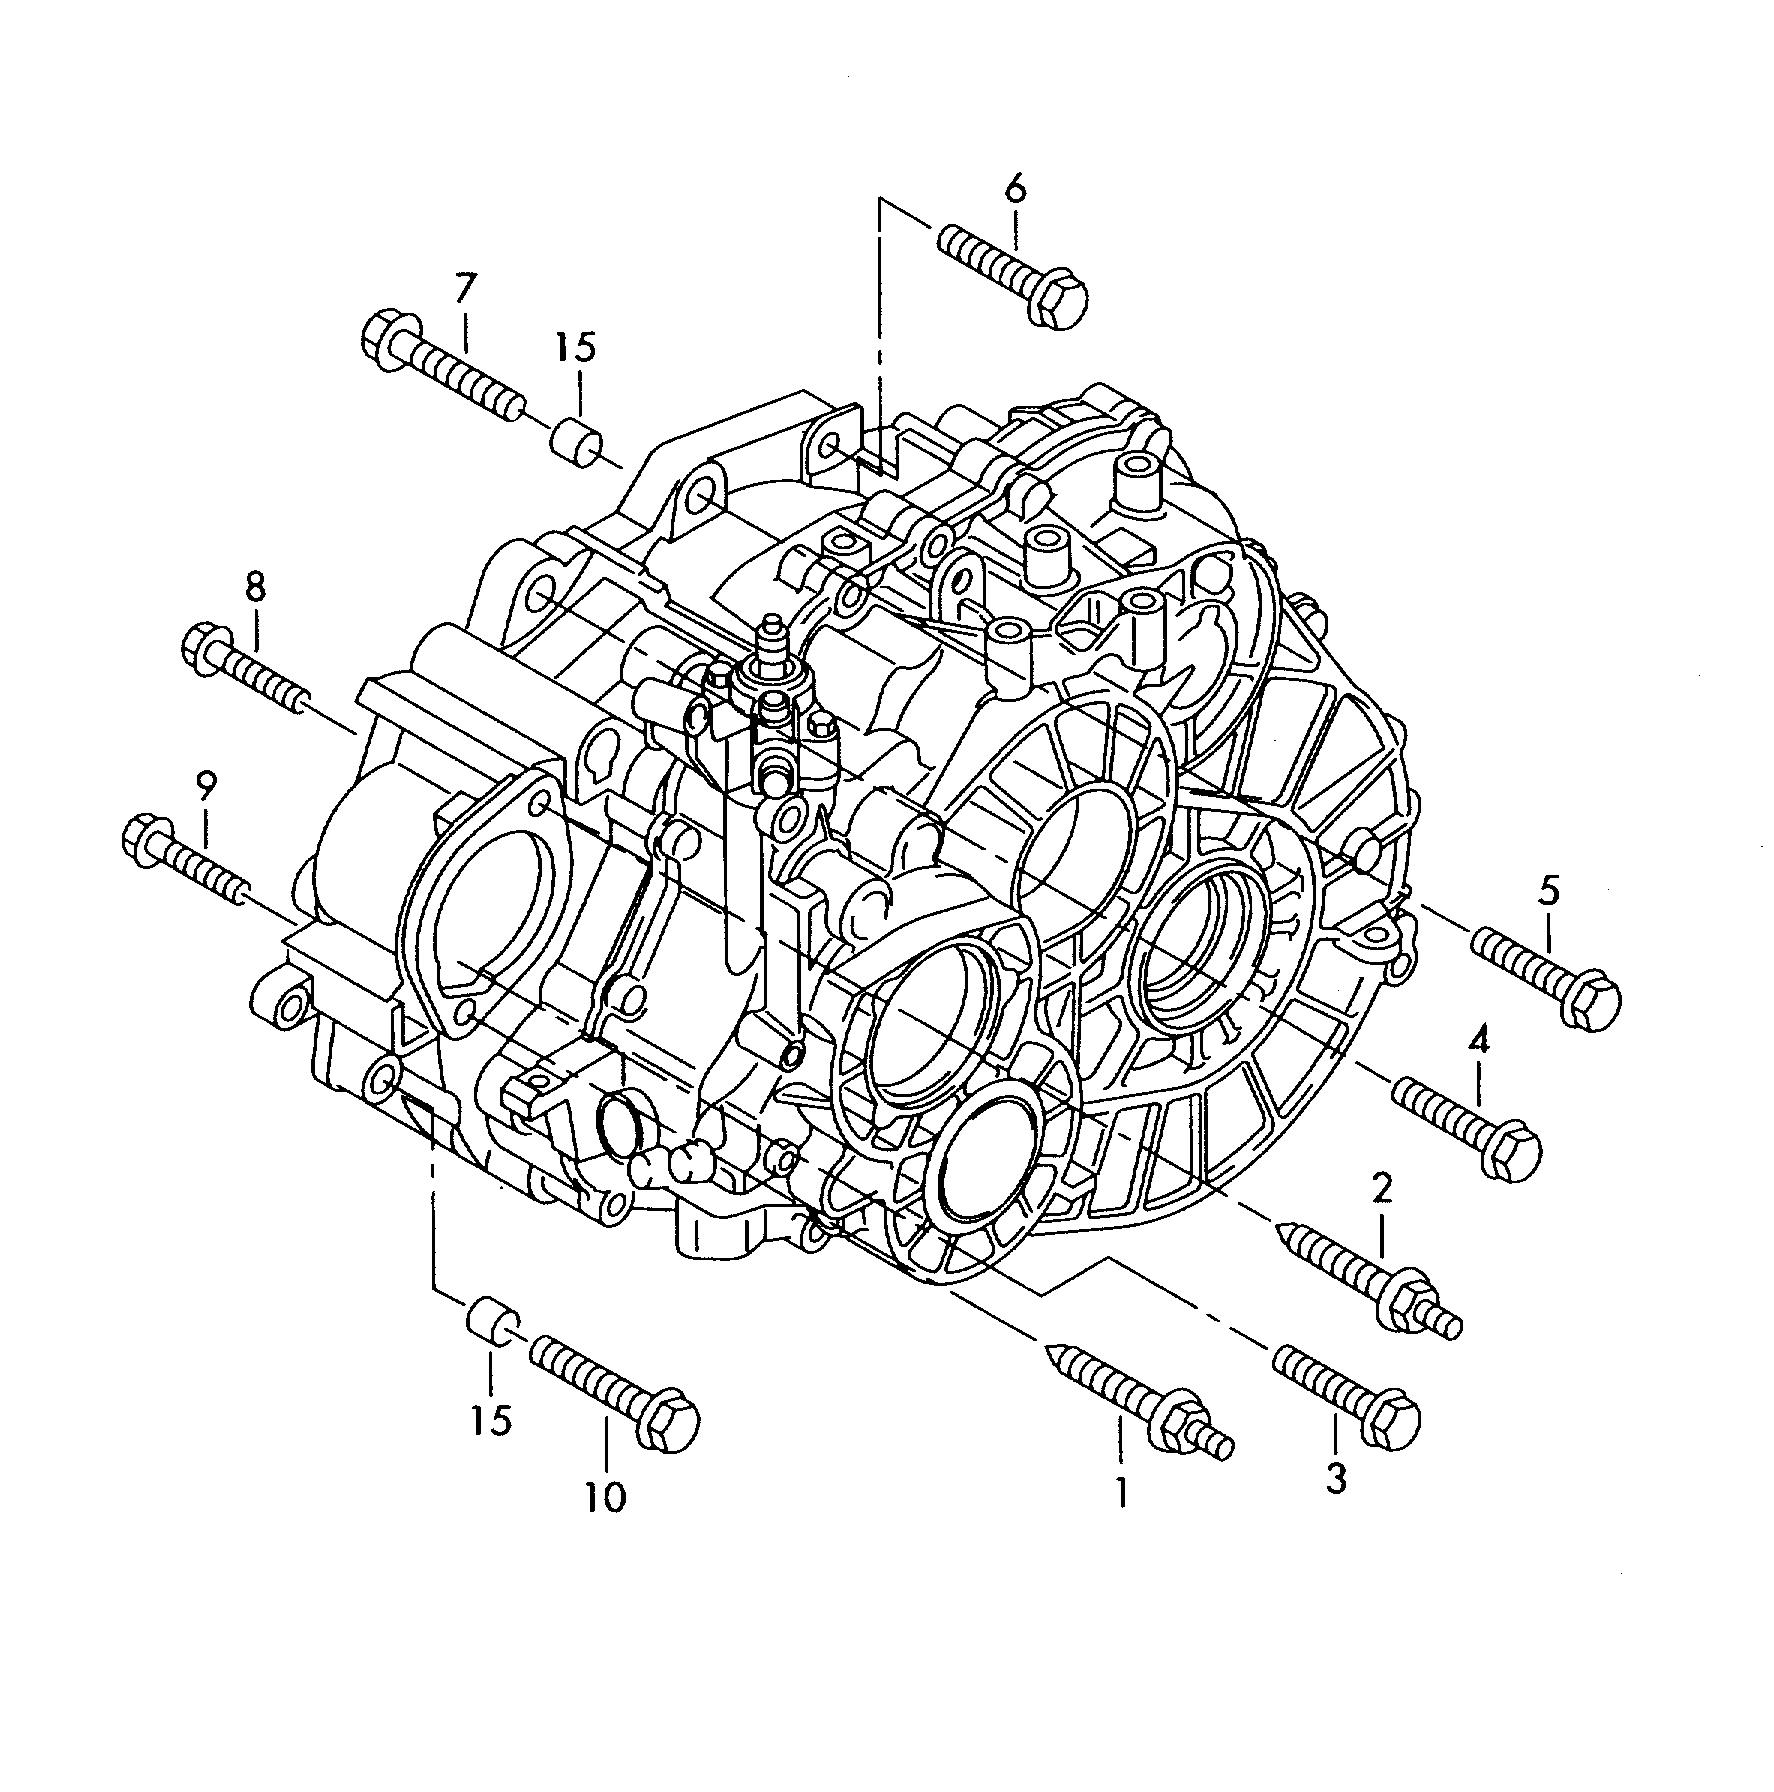 2012 Vw Tiguan Engine Diagram Wiring Diagrams Float Metal Float Metal Alcuoredeldiabete It